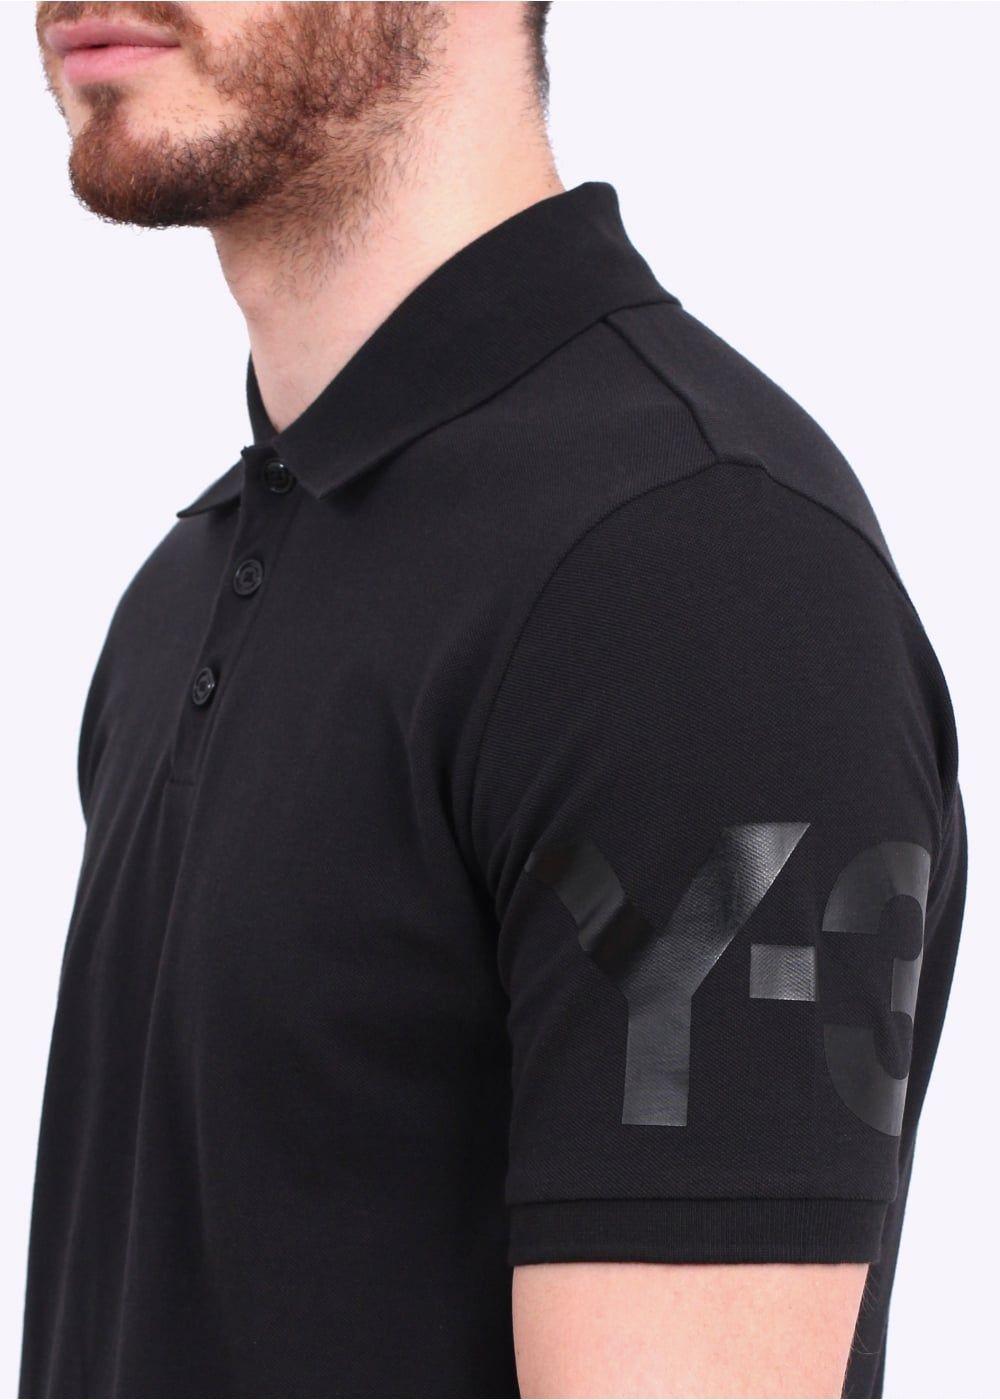 2407bb64 Y3 / Adidas - Yohji Yamamoto Classic Polo - Black   My Packaging ...